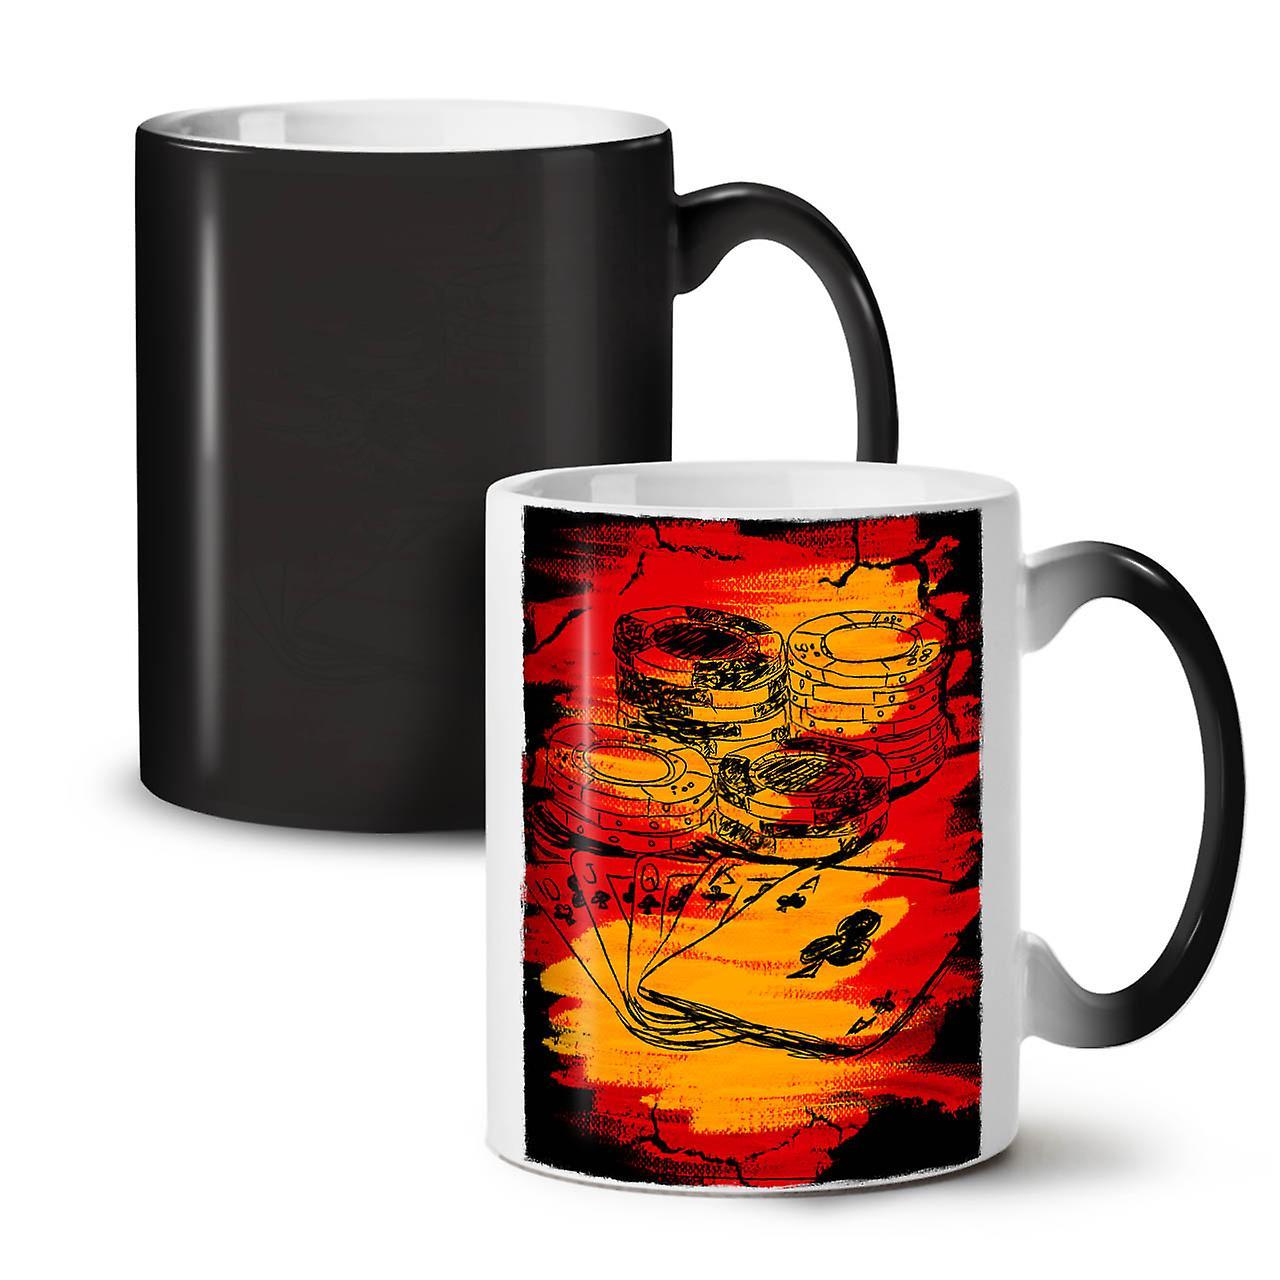 OzWellcoda Ceramic Tea Coffee Poker New Black Gamble 11 Colour Changing Mug dCexBo